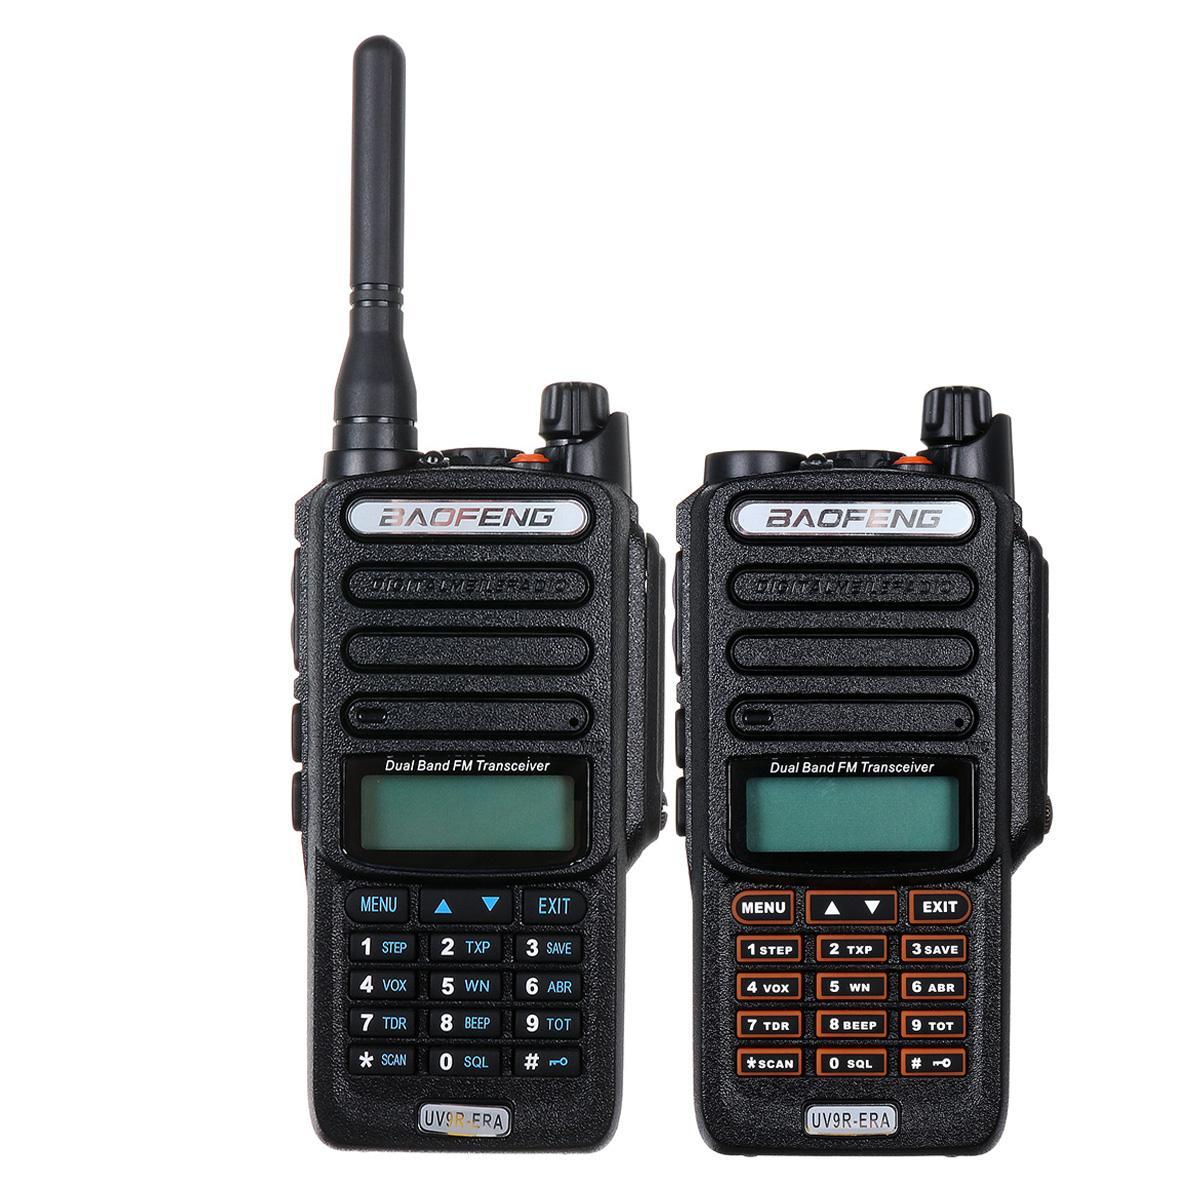 UV9R-ERA Walkie Talkie profesional UV Radio de dos vías Comunicador HF transmisor estación de Radio 15km rango de conversación IP57